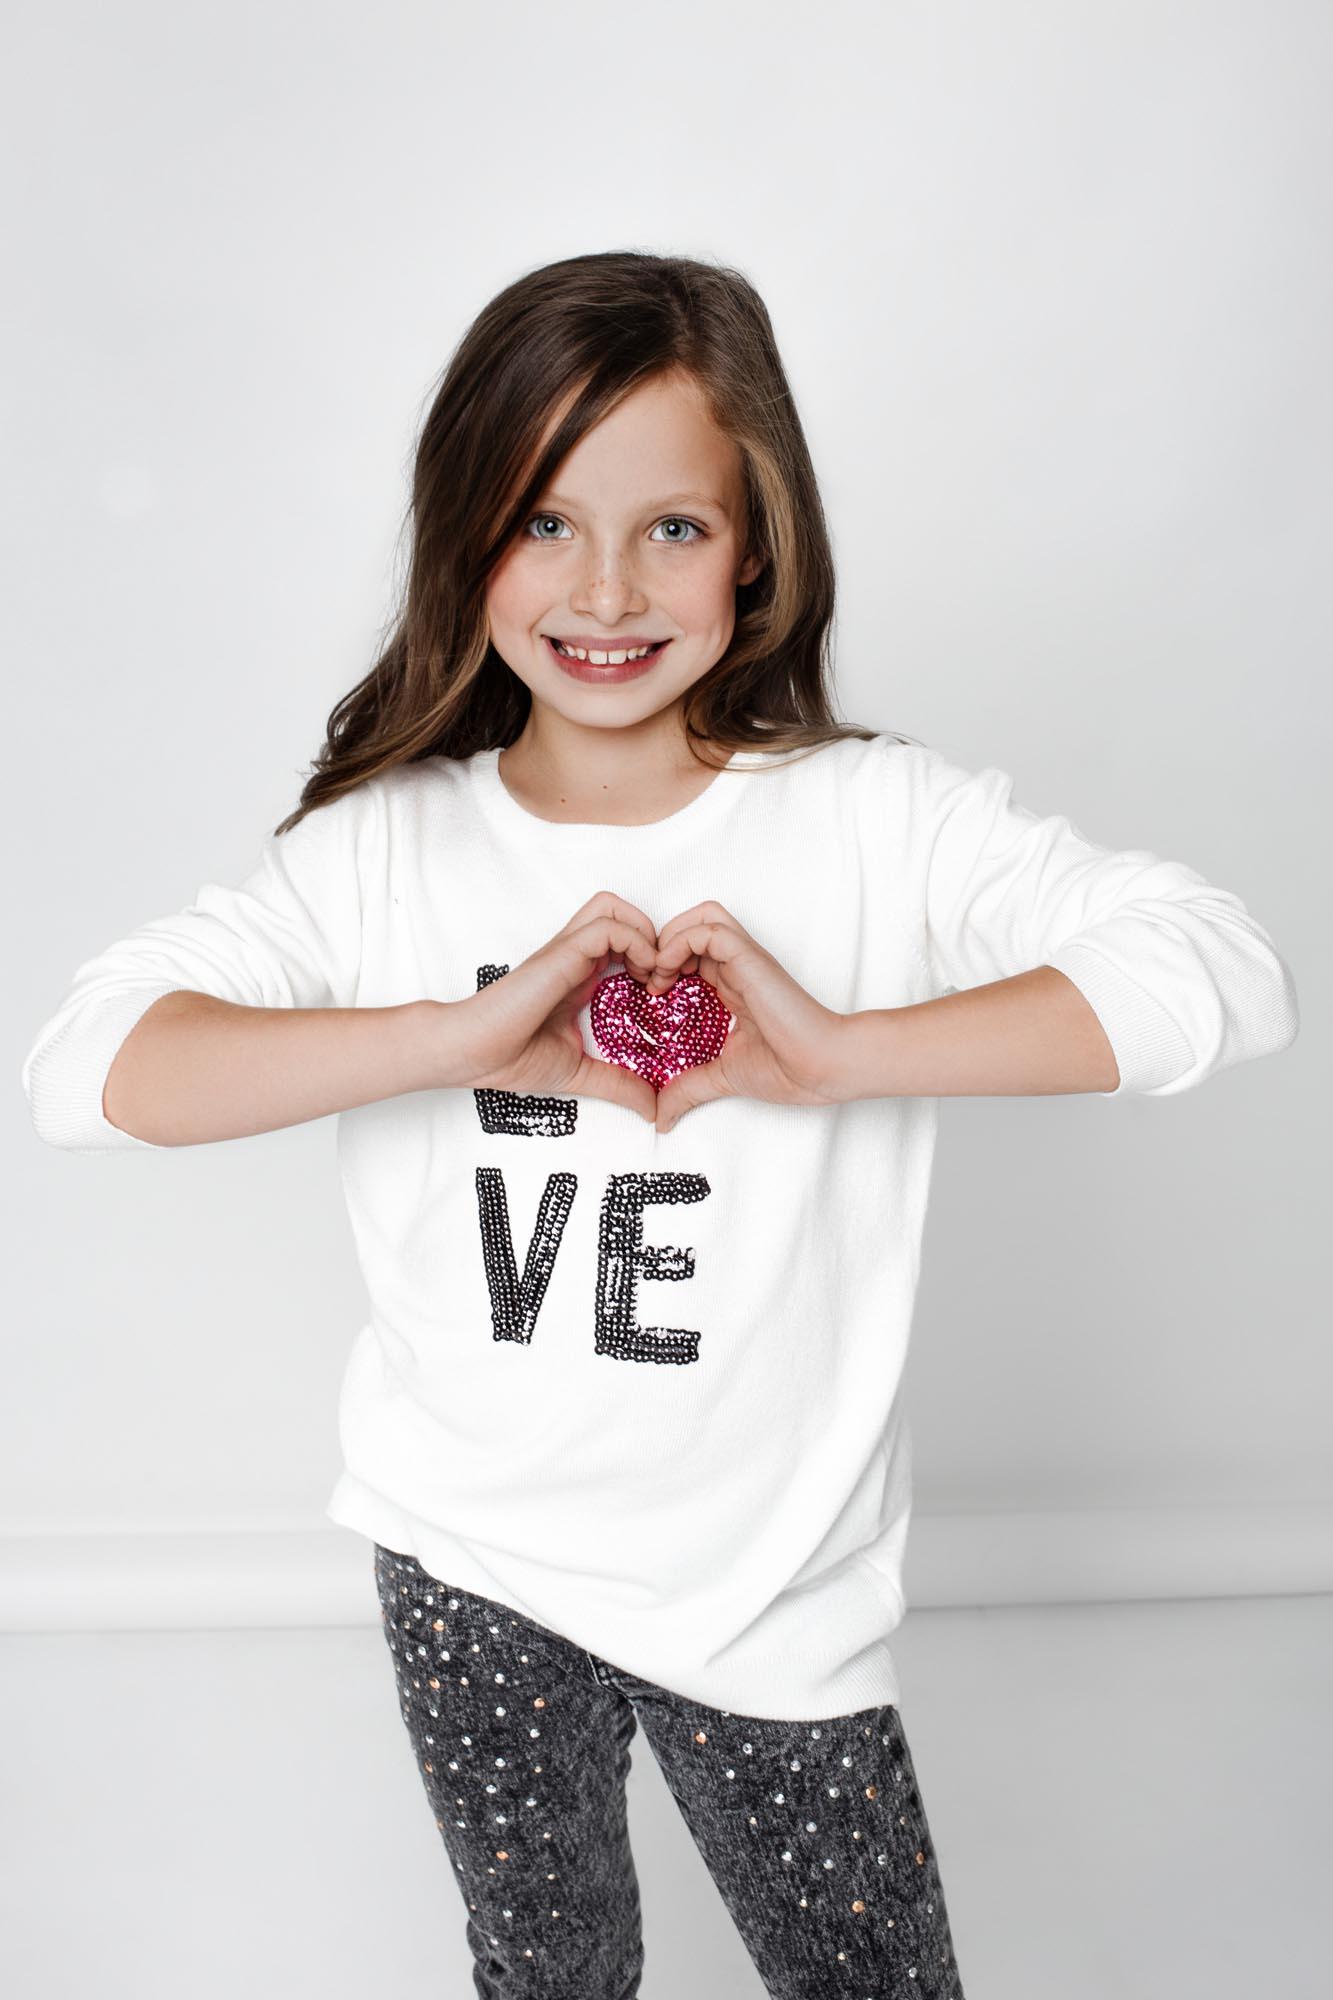 nyc-photographers-kids-modeling-10011.jpg